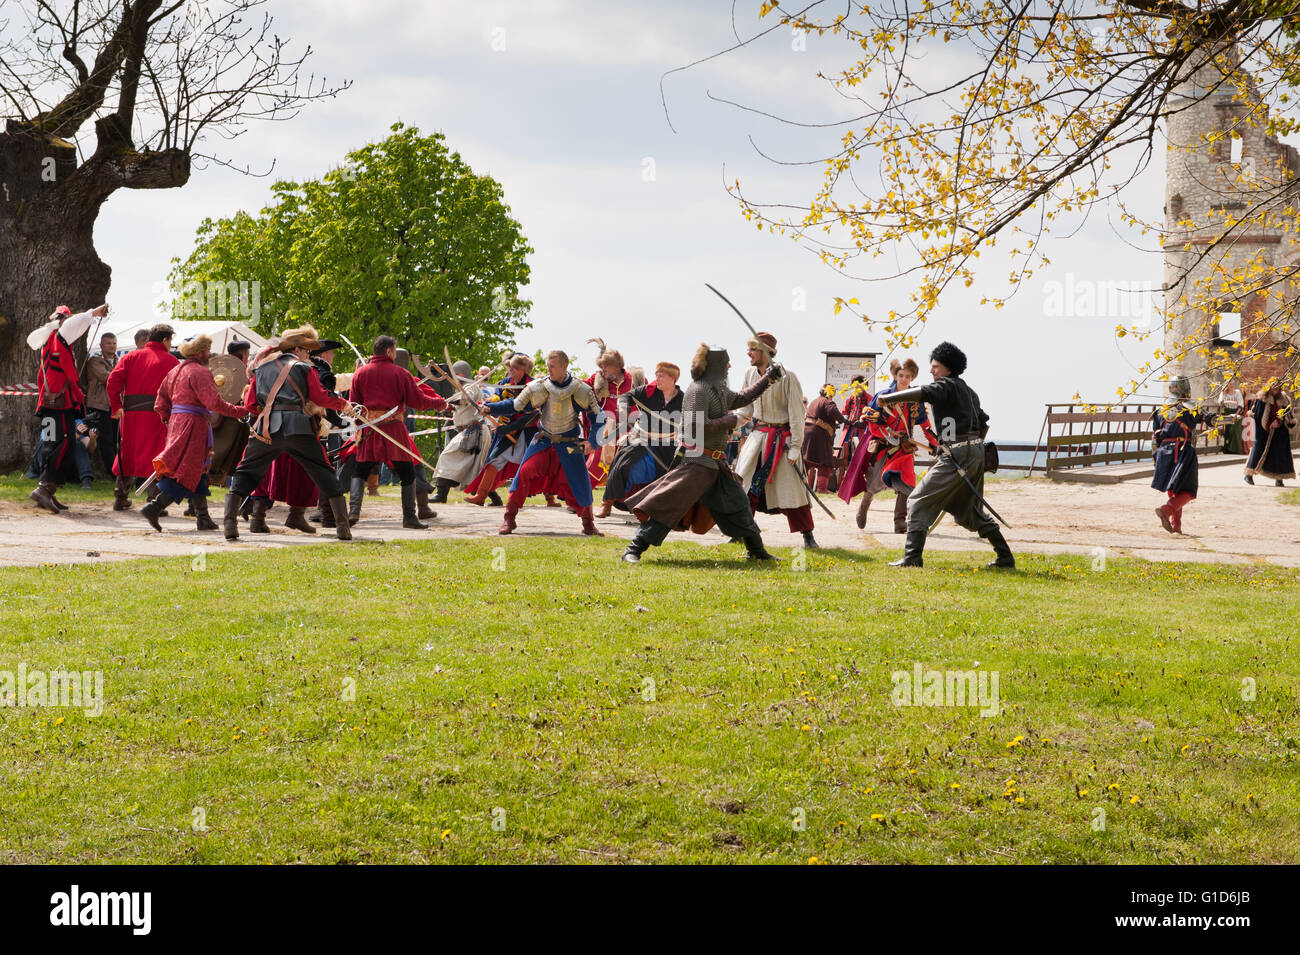 Historical battle reenactment in Janowiec Castle, Swedish assault improvisation event at Majowka z Kmicicem show, - Stock Image